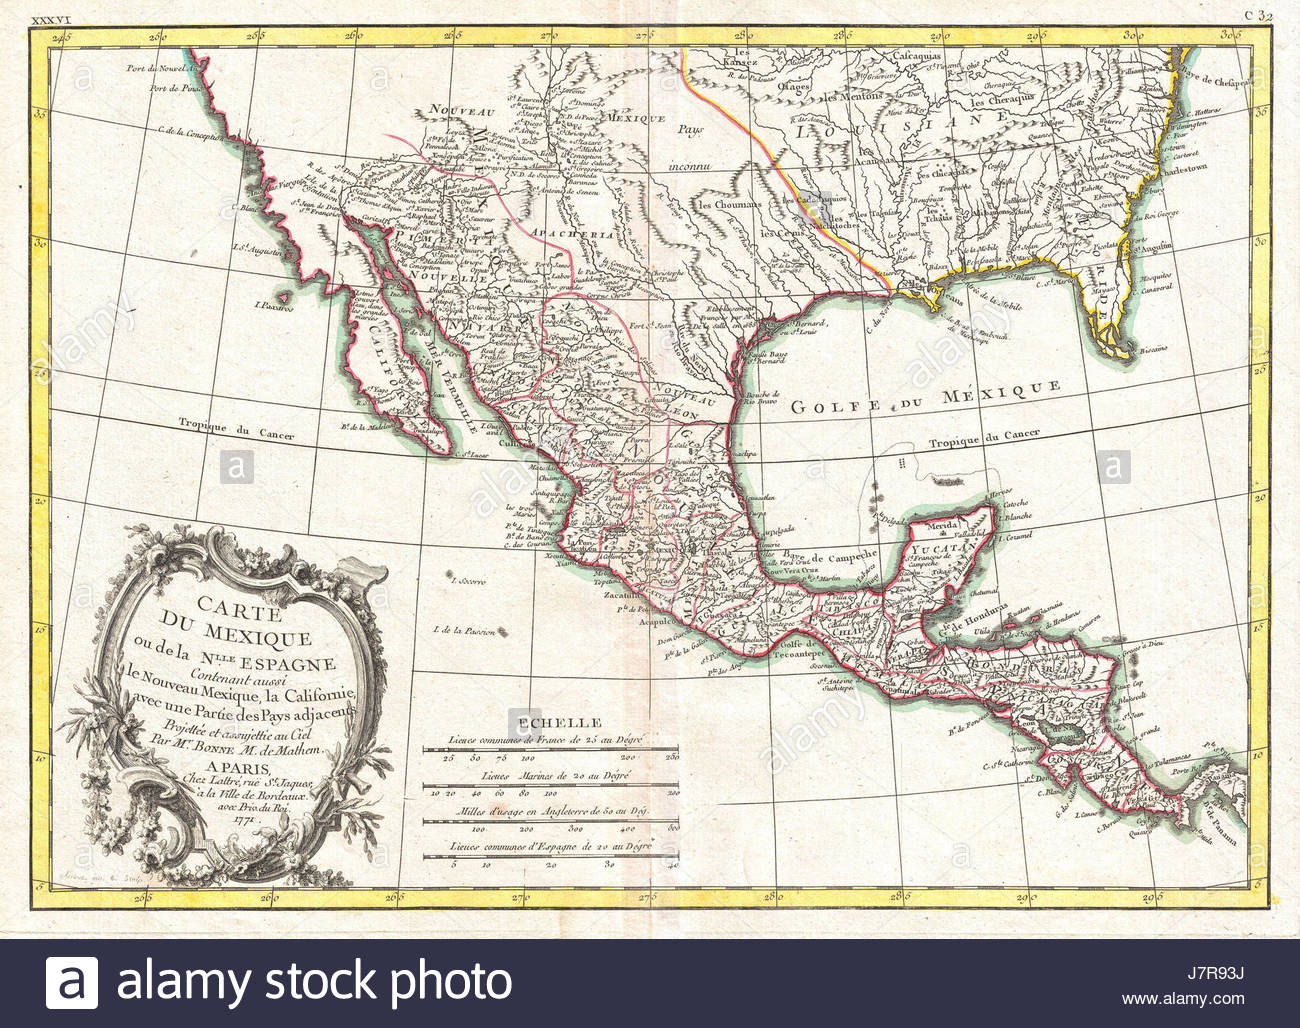 1771 Bonne Map Of Mexico (Texas), Louisiana And Florida Stock Photo - Texas Louisiana Map